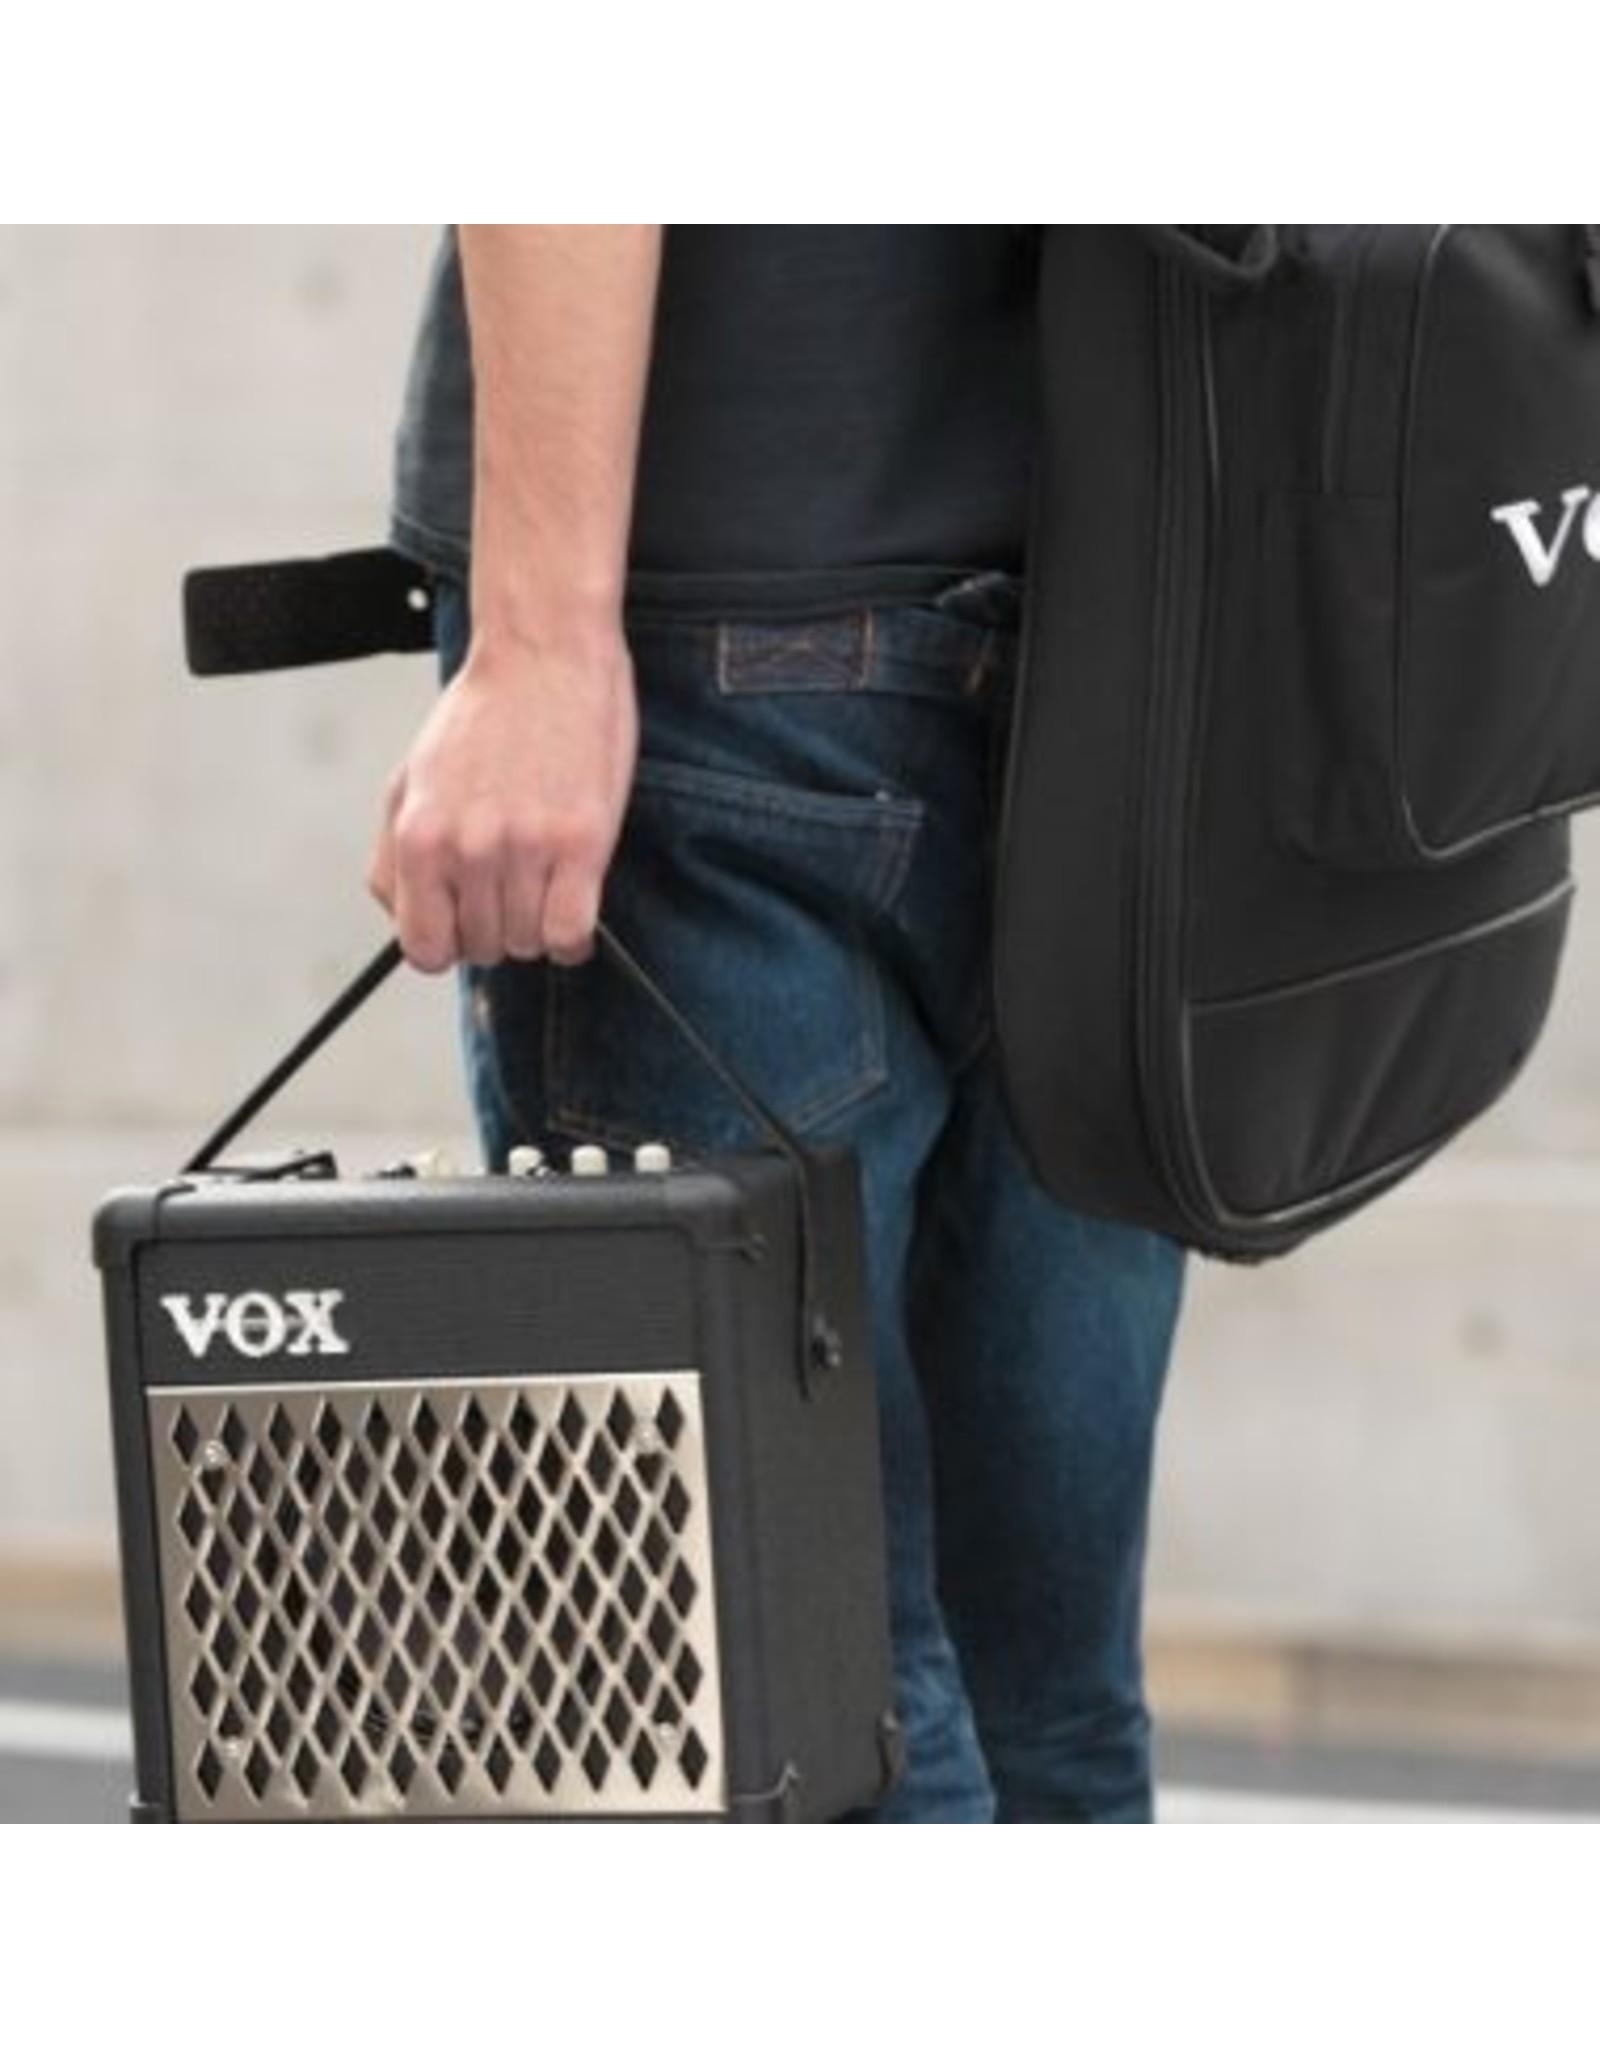 Vox Vox Mini 5 Rhythm Classic Amp